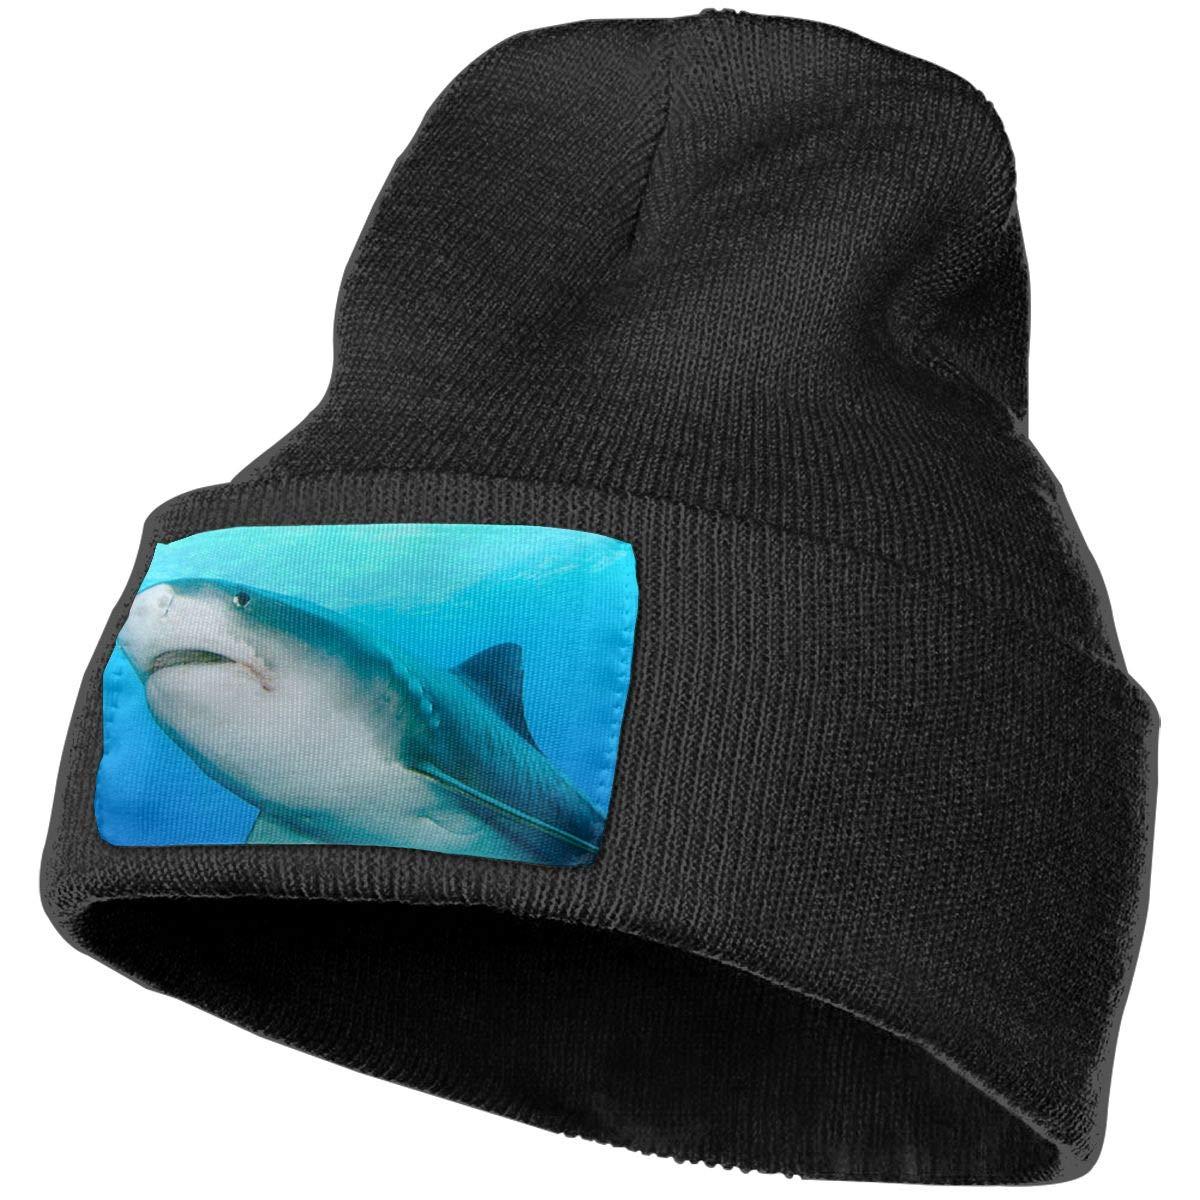 SHARP-Q Shark